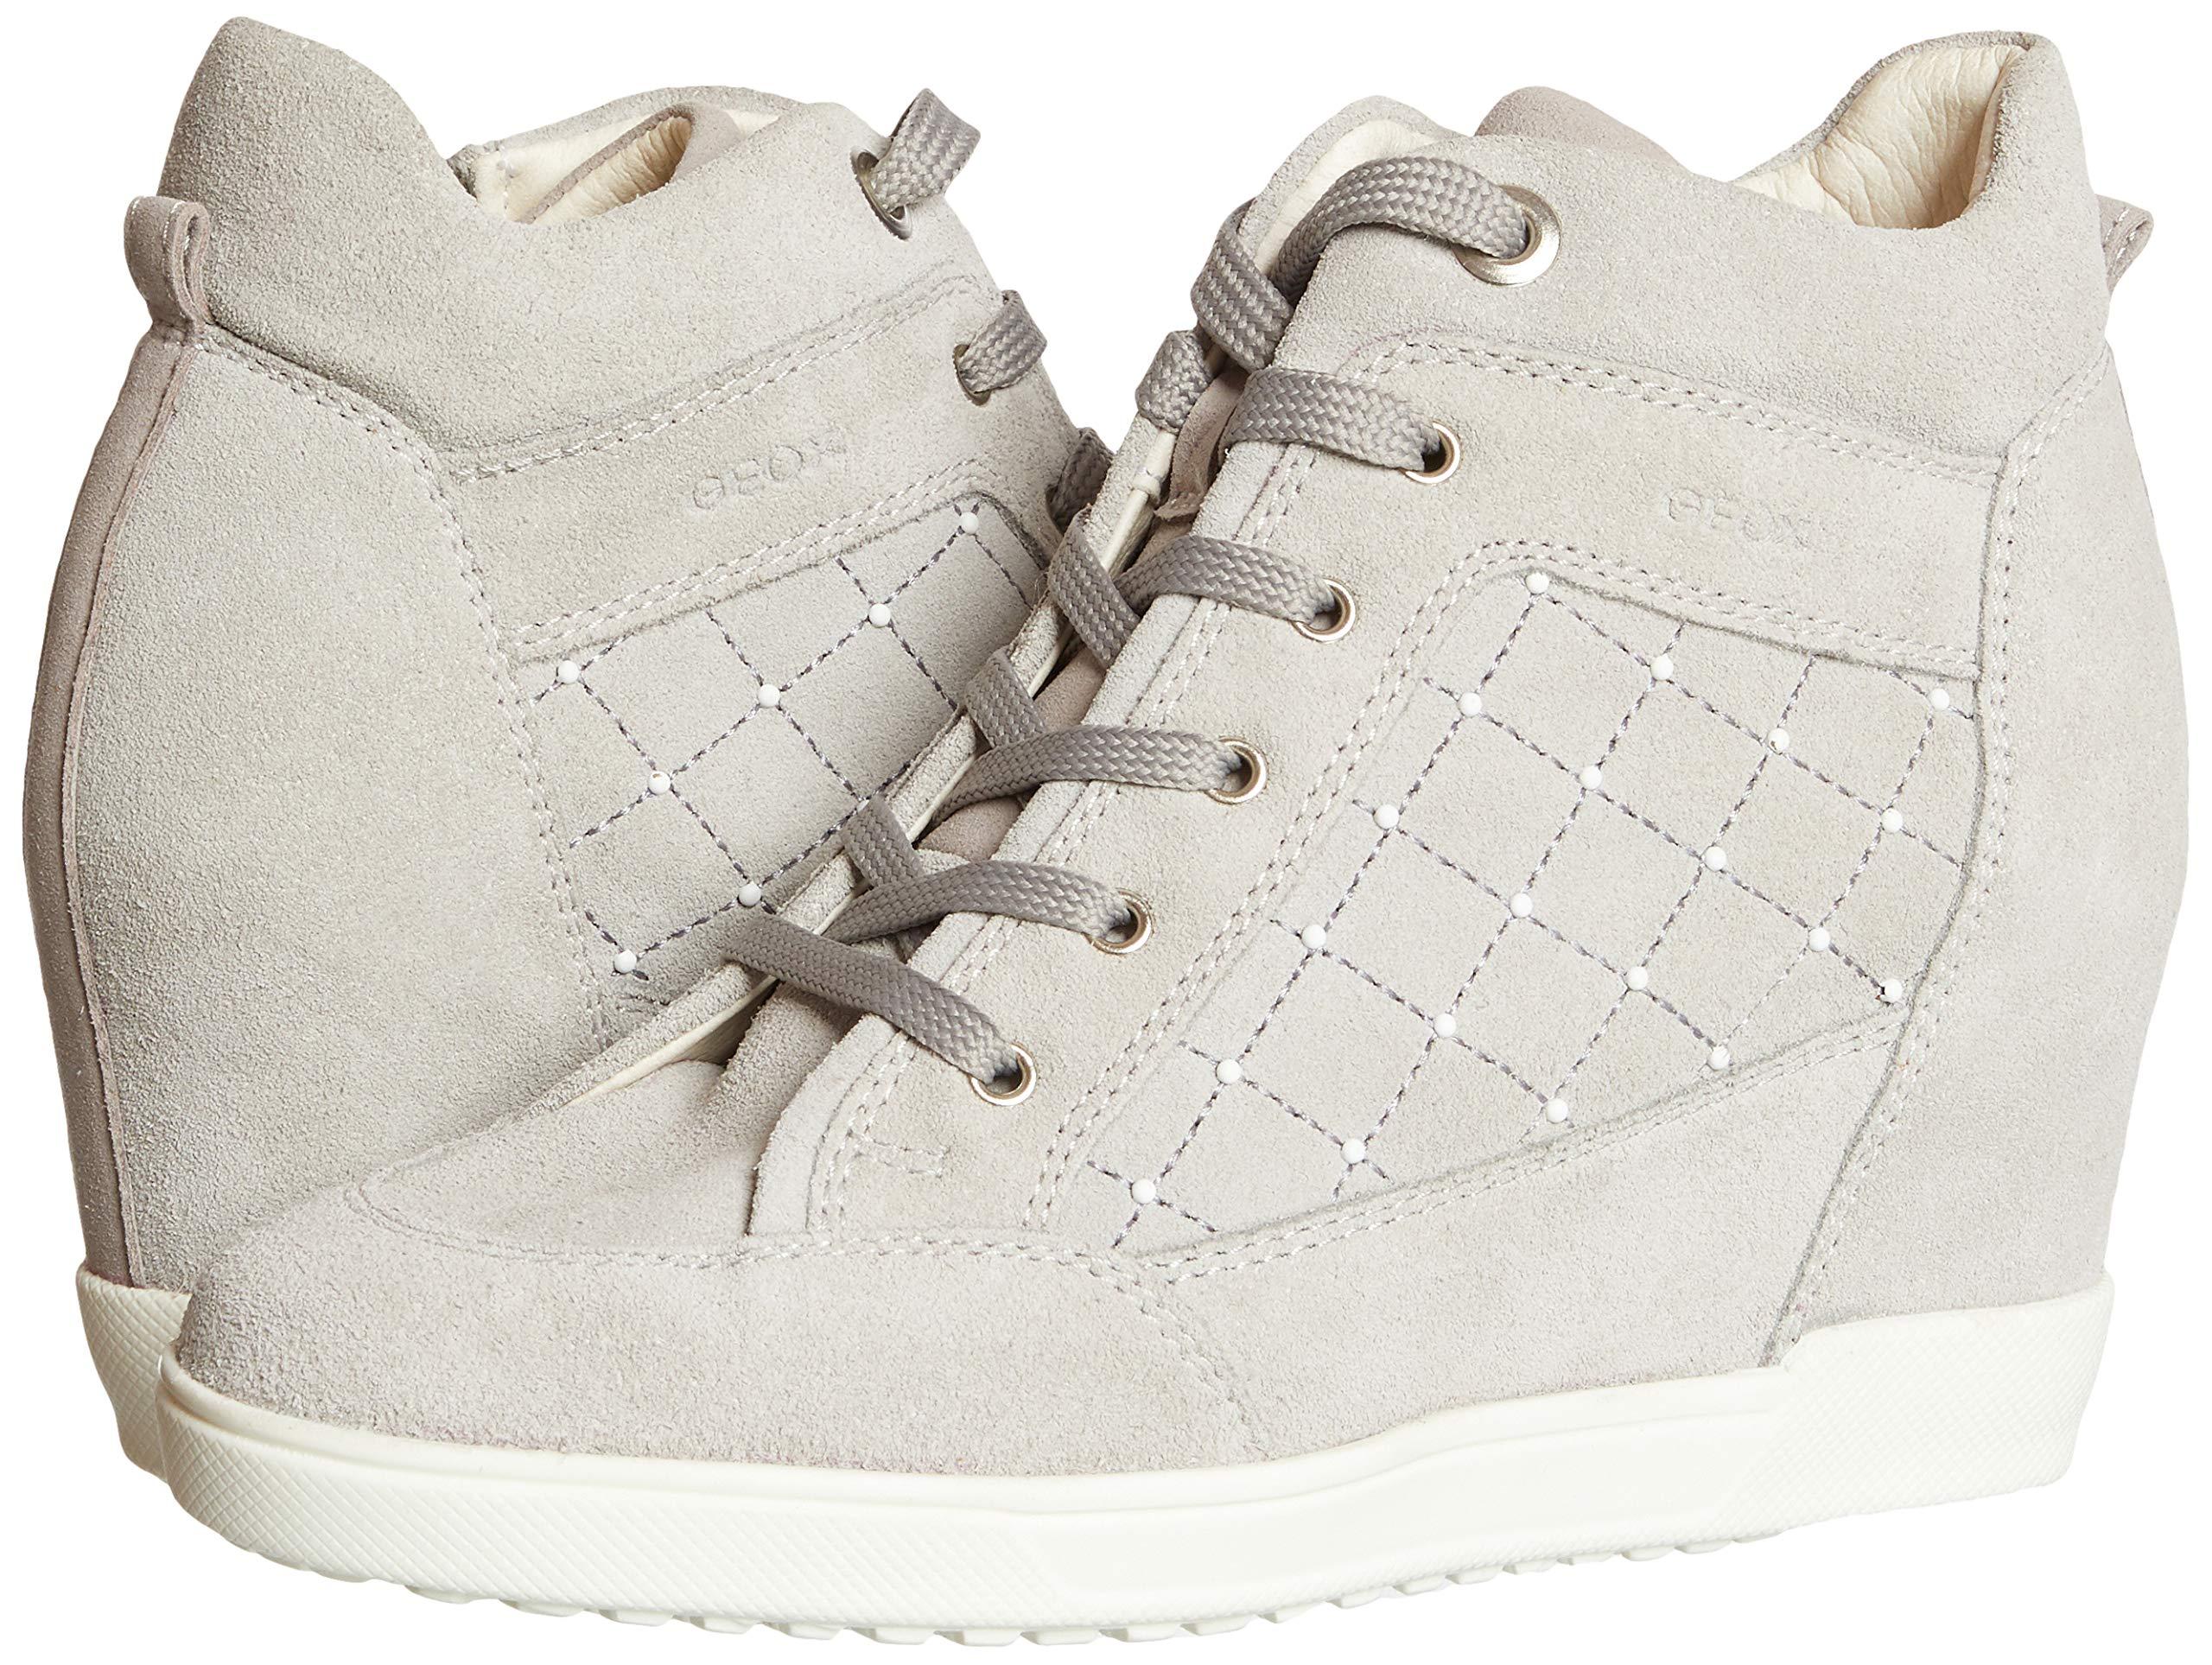 Desanimarse Práctico Desmantelar  Geox Women's D Carum C Hi-Top Sneakers- Buy Online in Albania at  albania.desertcart.com. ProductId : 119561553.